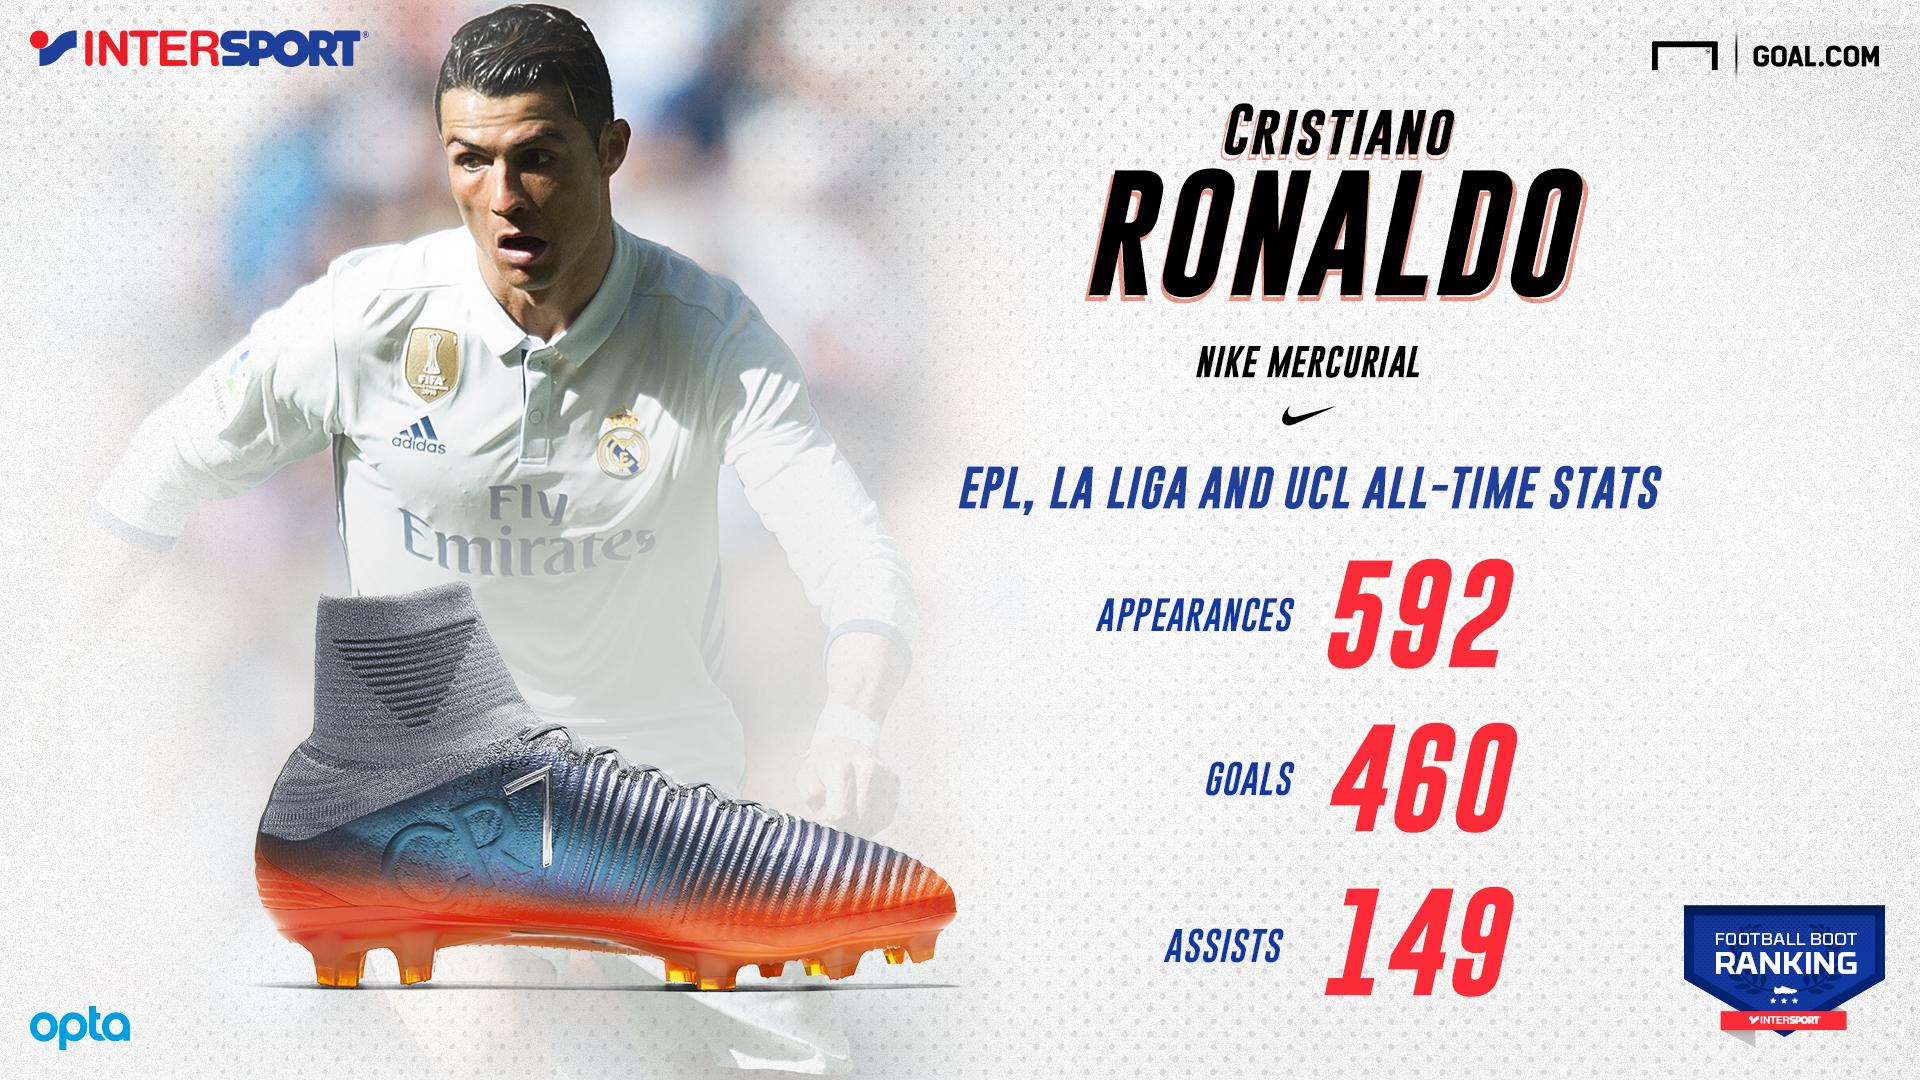 Ronaldo infographic English updated April 18